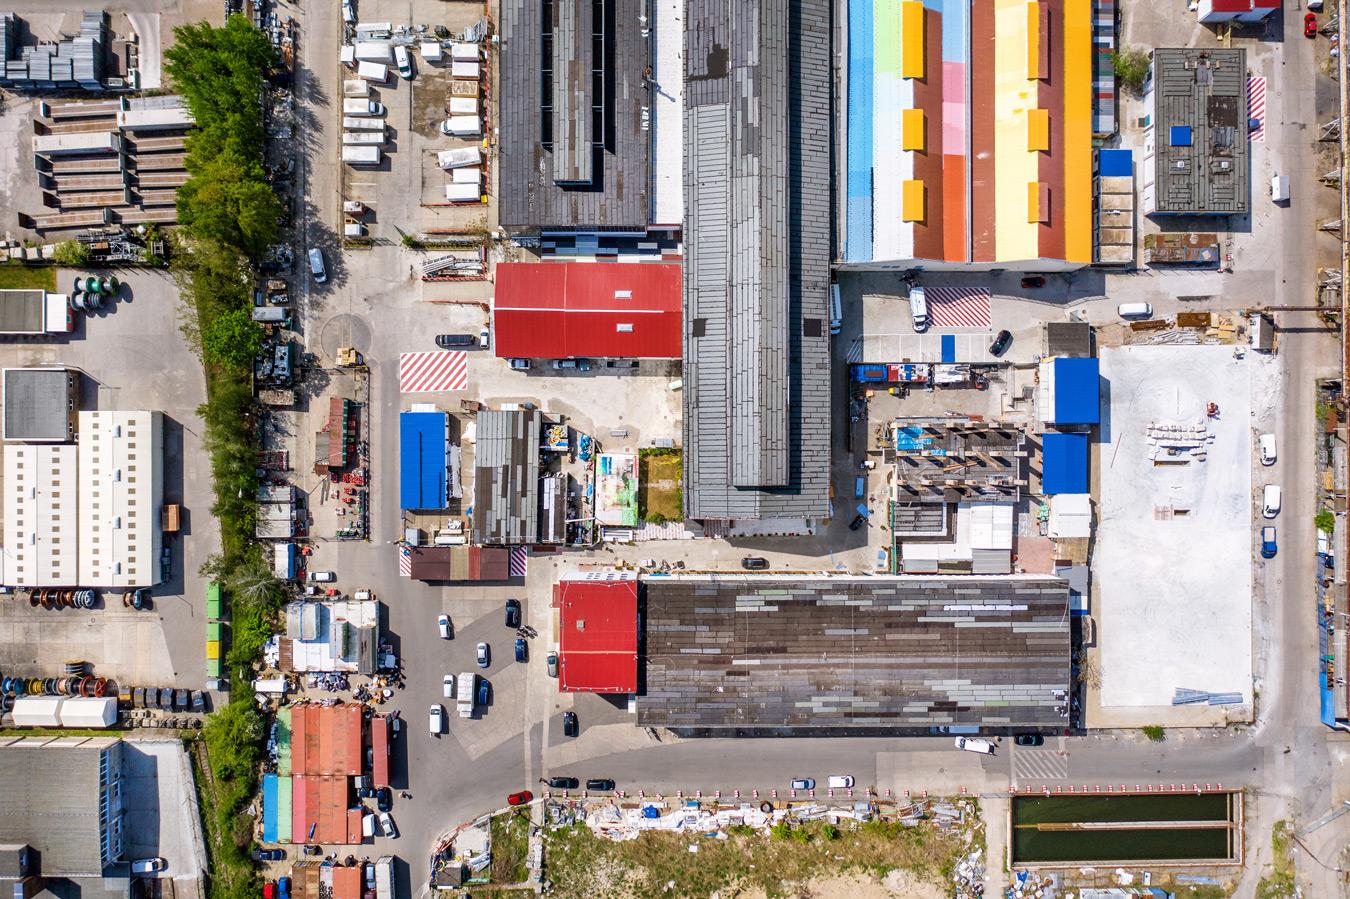 Luftbildaufnahmen in Berlin Marco van Oel